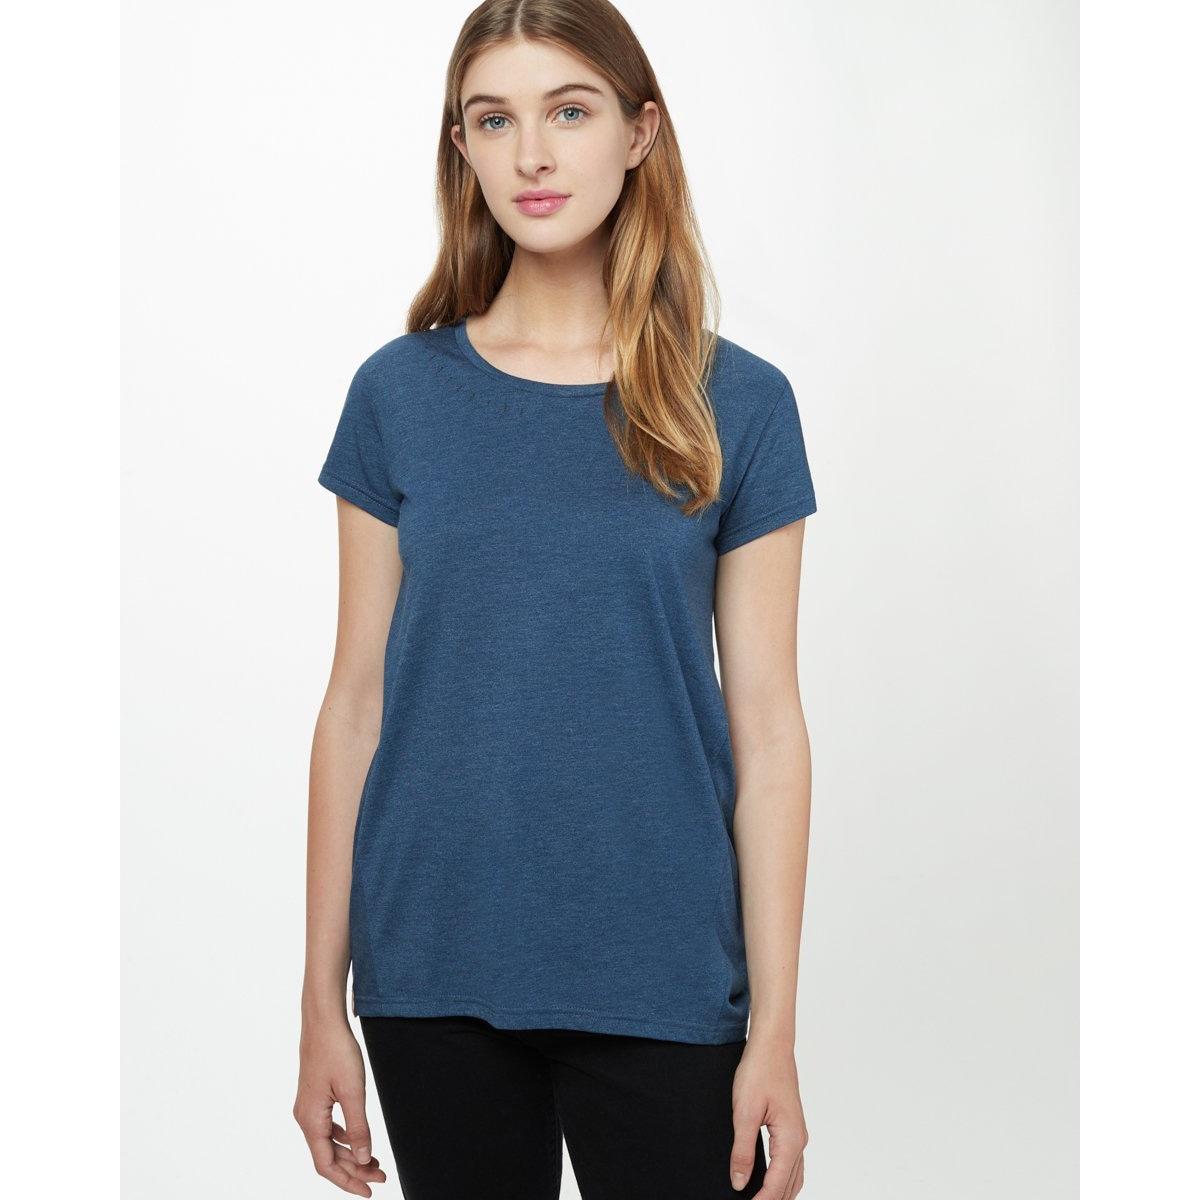 Timberline Short Sleeve - Women's